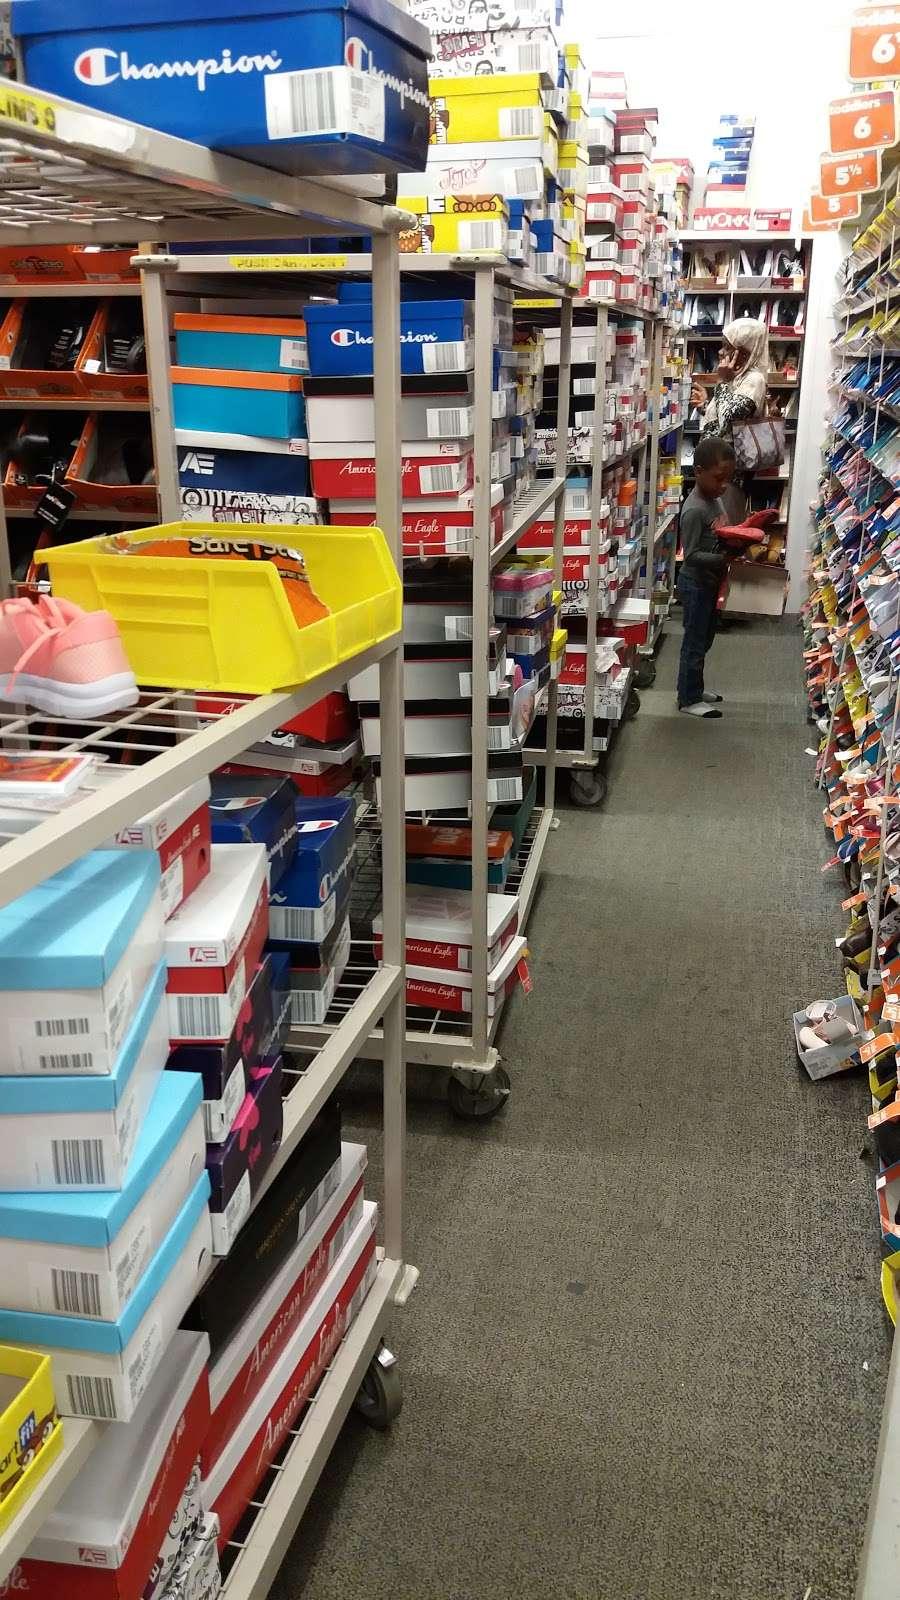 Payless ShoeSource - shoe store  | Photo 2 of 5 | Address: 2260 Bartow Ave, Bronx, NY 10475, USA | Phone: (718) 379-5894